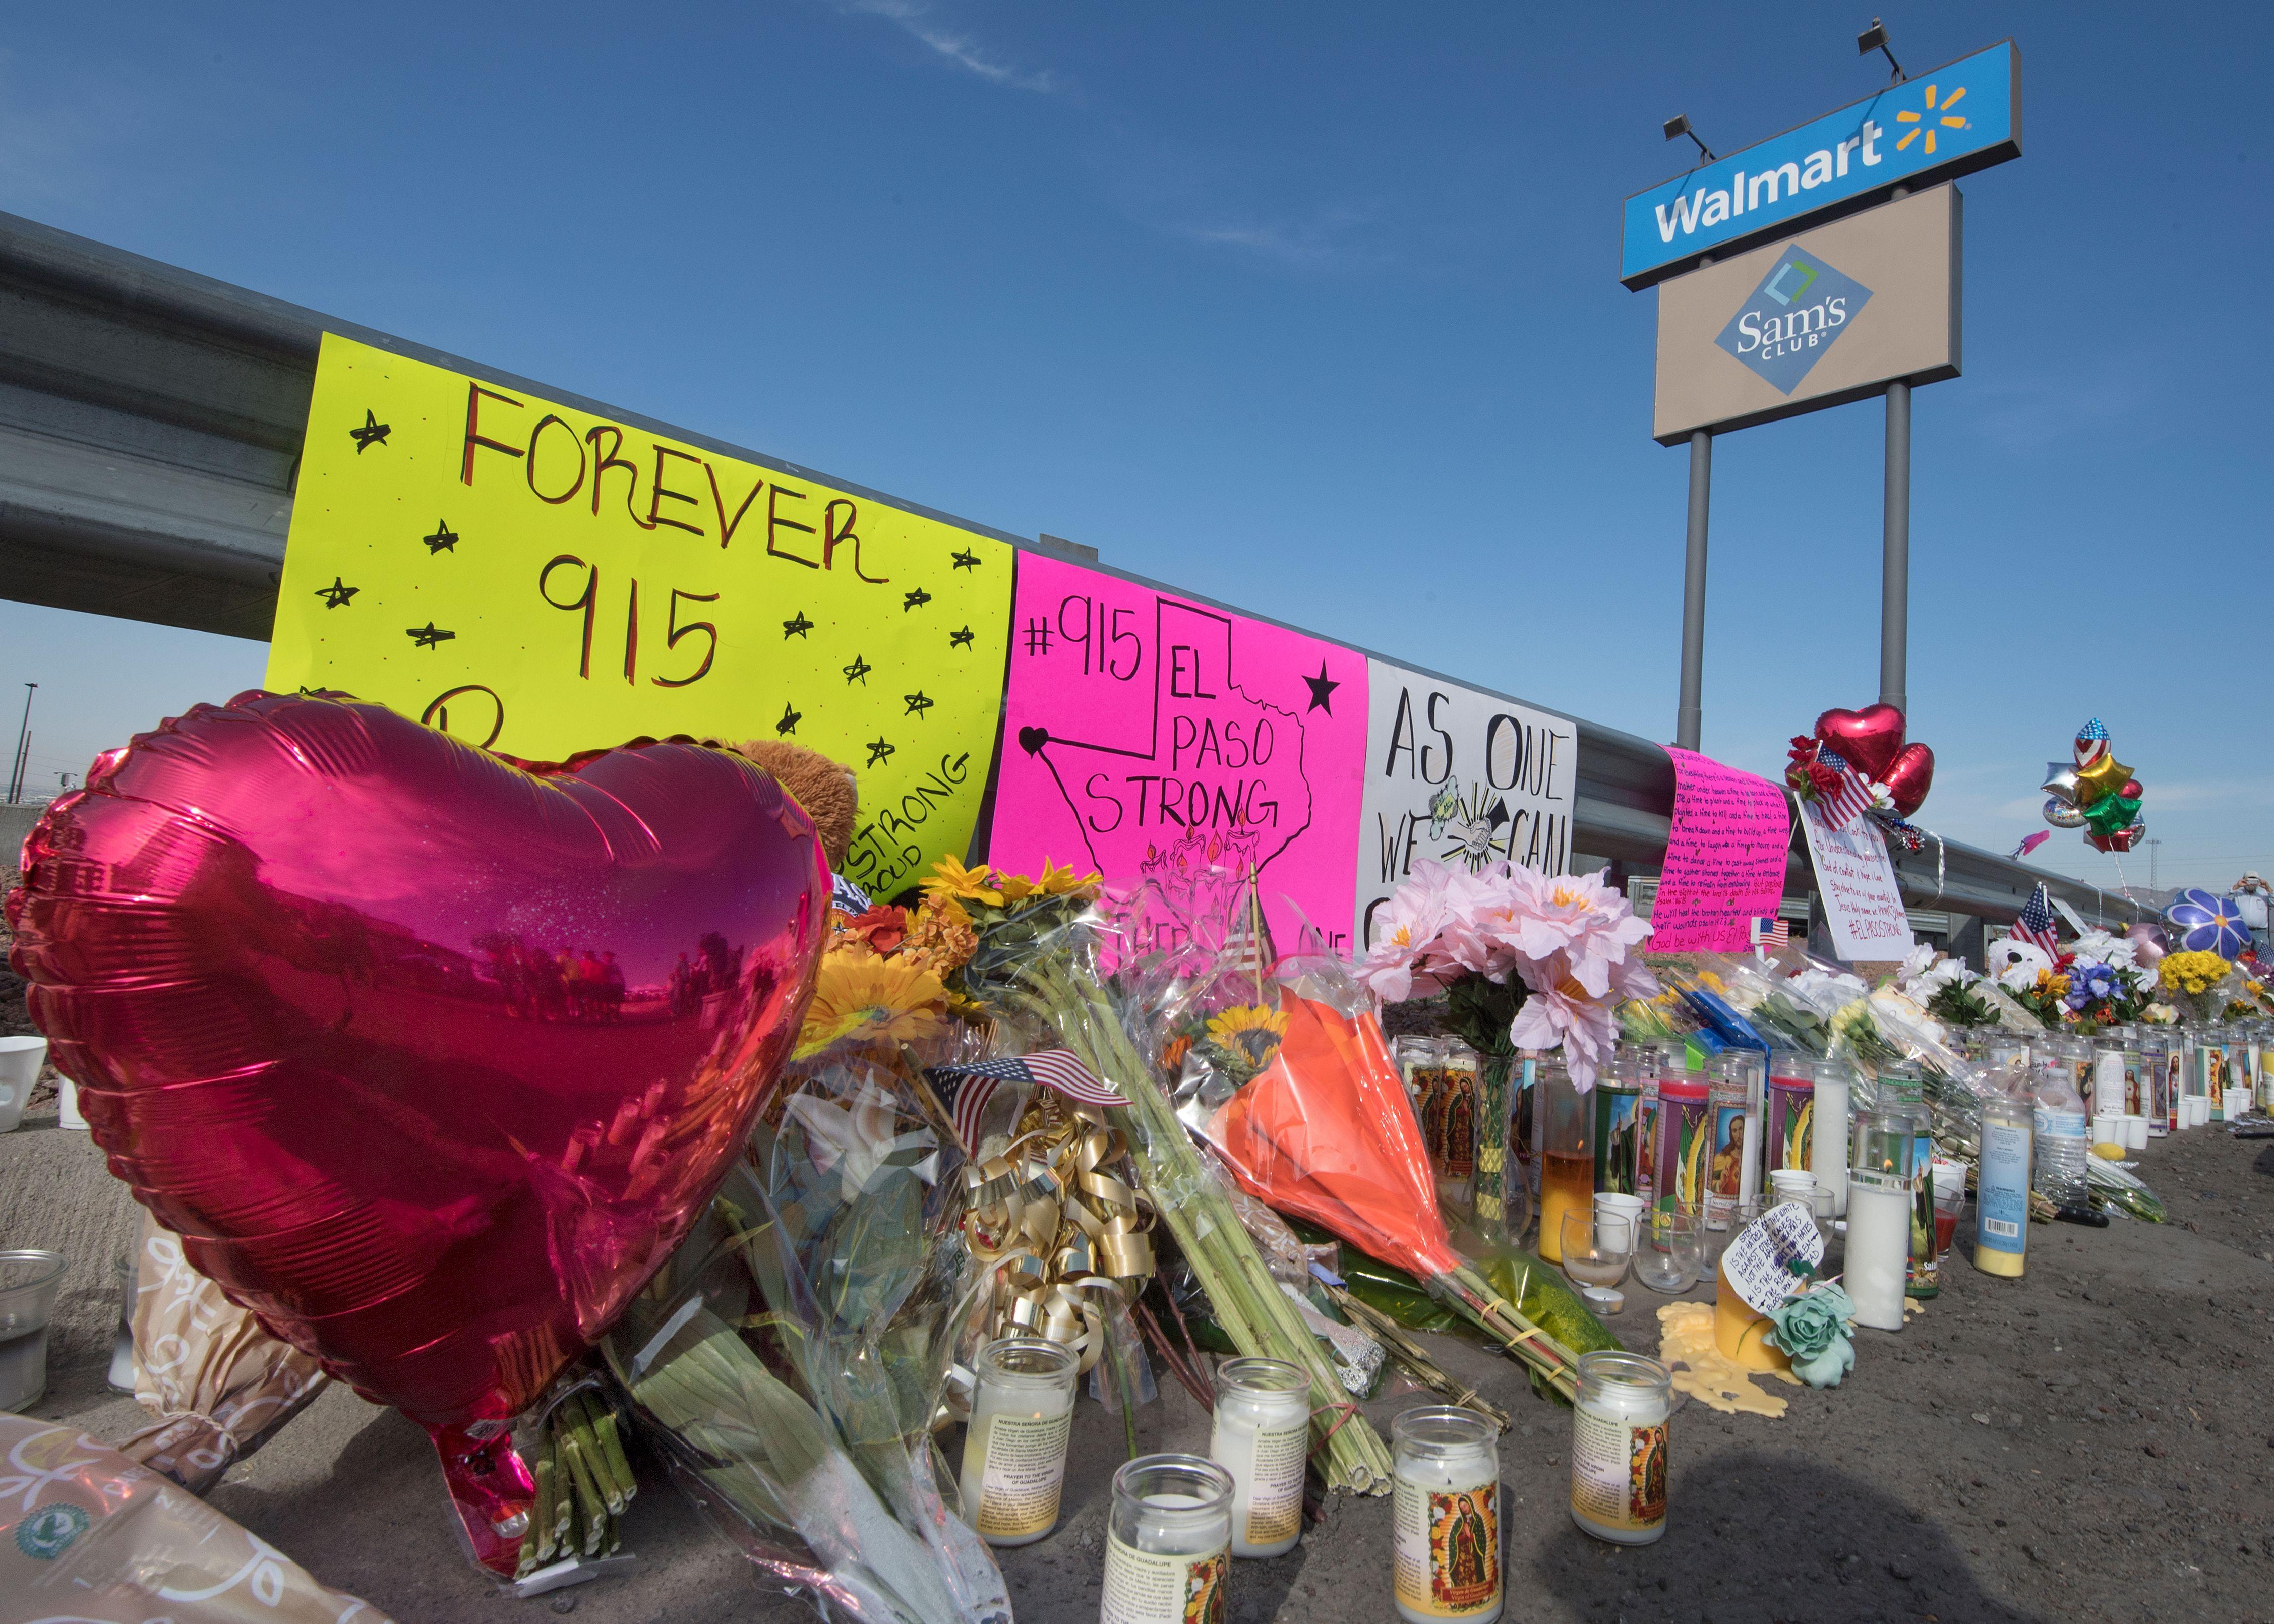 A memorial for the El Paso shooting victims